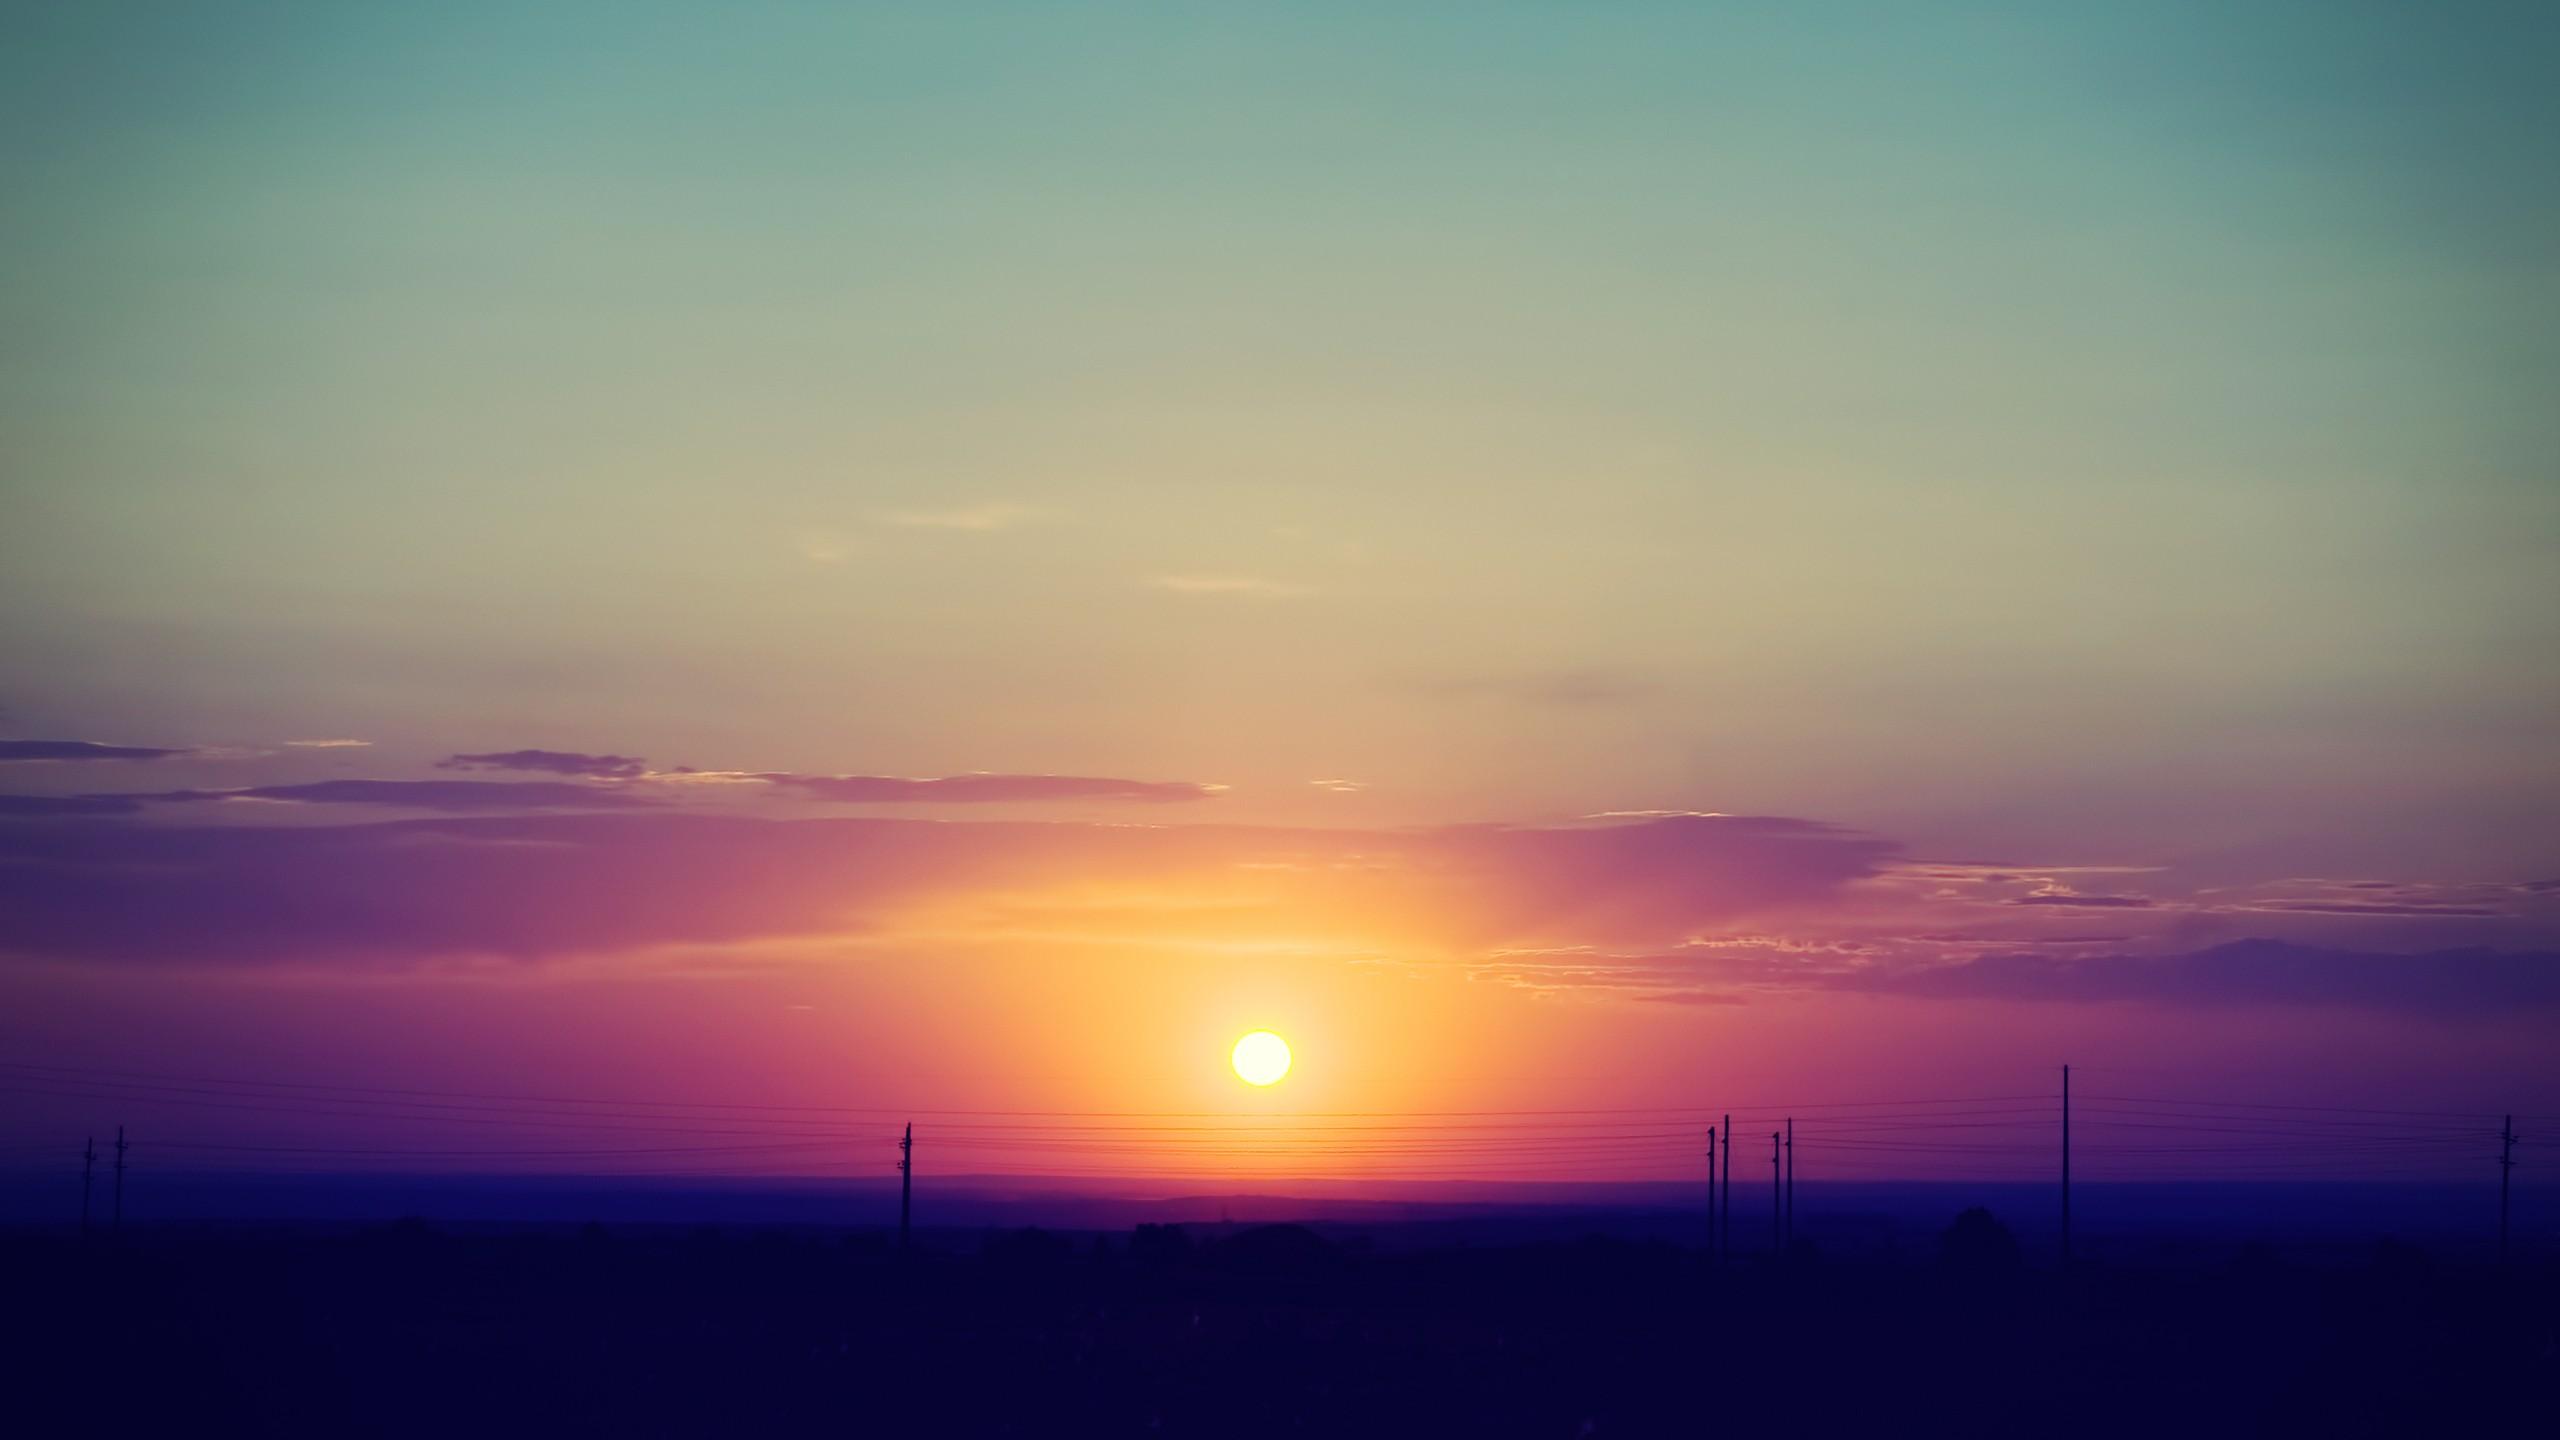 Free Download 2560x1440 Summer Sunset Desktop Pc And Mac Wallpaper 2560x1440 For Your Desktop Mobile Tablet Explore 44 2560x1440 Wallpaper Tumblr Cute Desktop Wallpapers Tumblr 2440 X 1440 Wallpaper 2560 X 1440 Wallpaper Anime